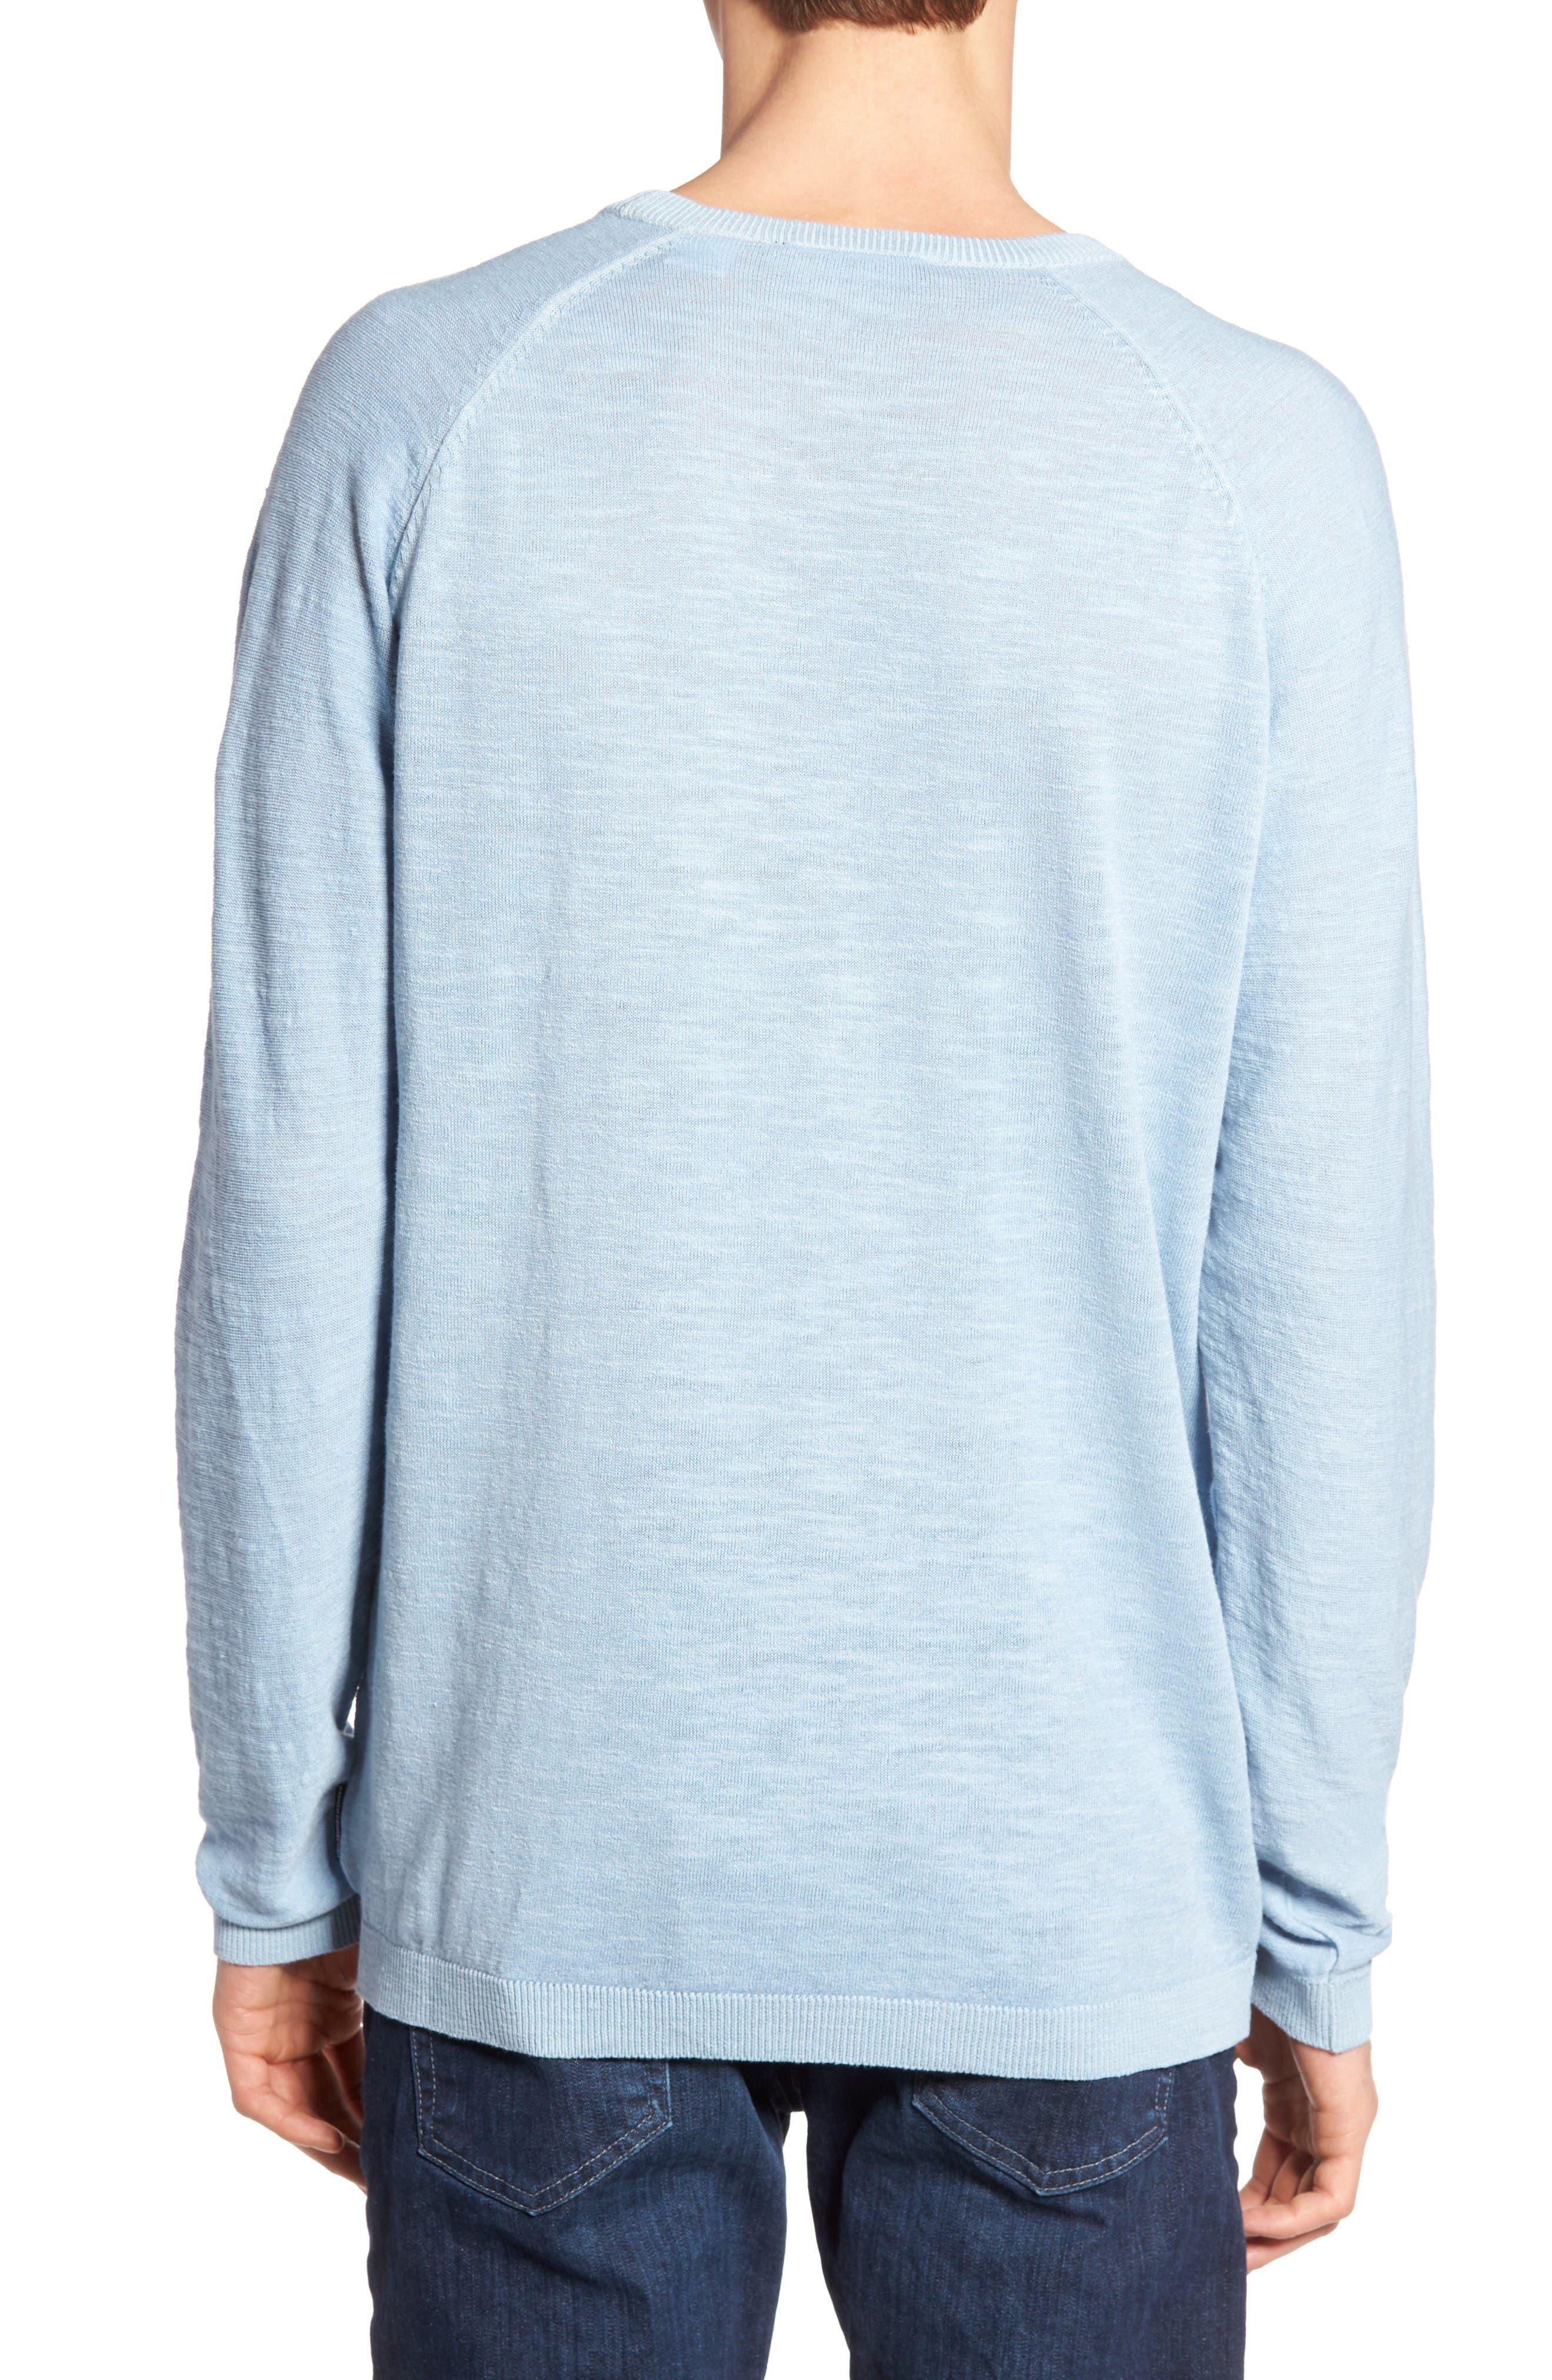 Arambol Cotton & Linen Sweater,                             Alternate thumbnail 2, color,                             Blue Lagoon